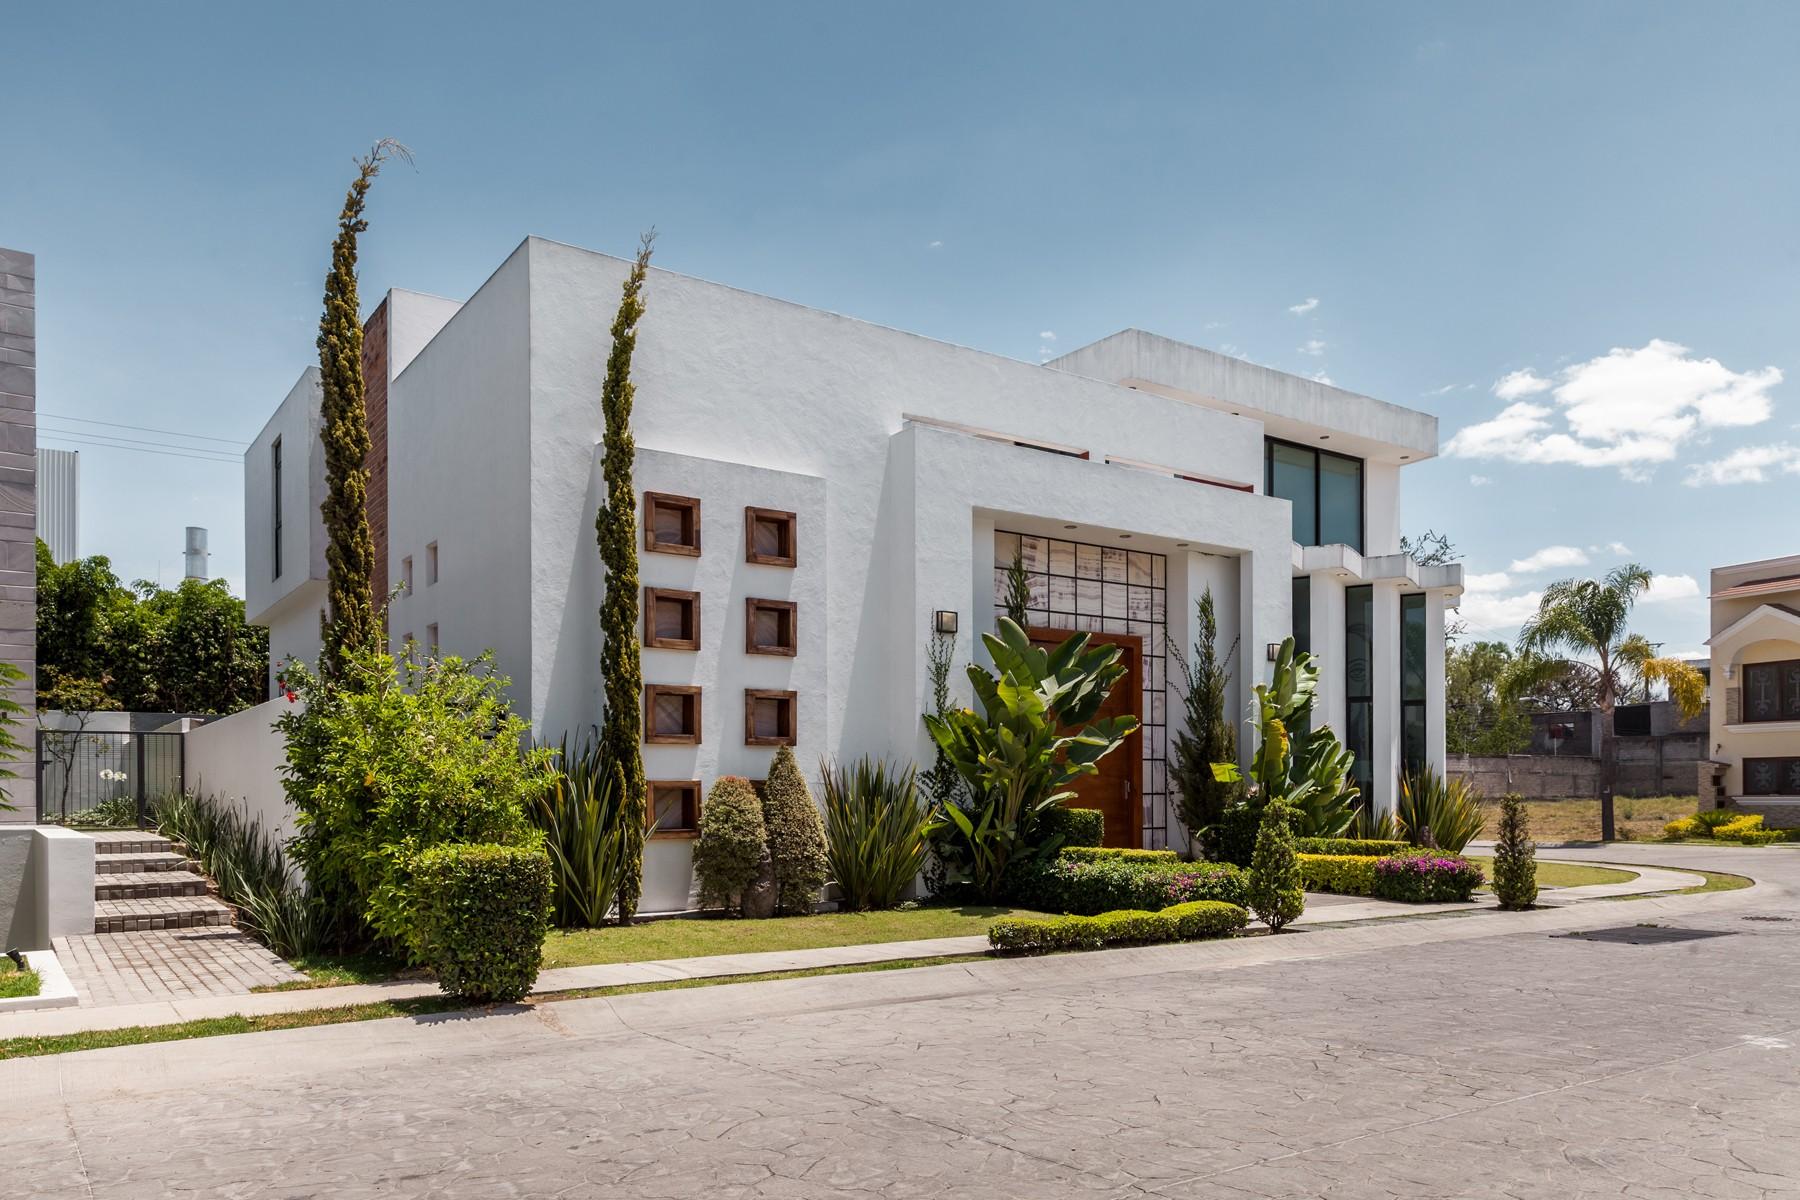 Residencia Calli, Rinconada del Bosque, Zapopan